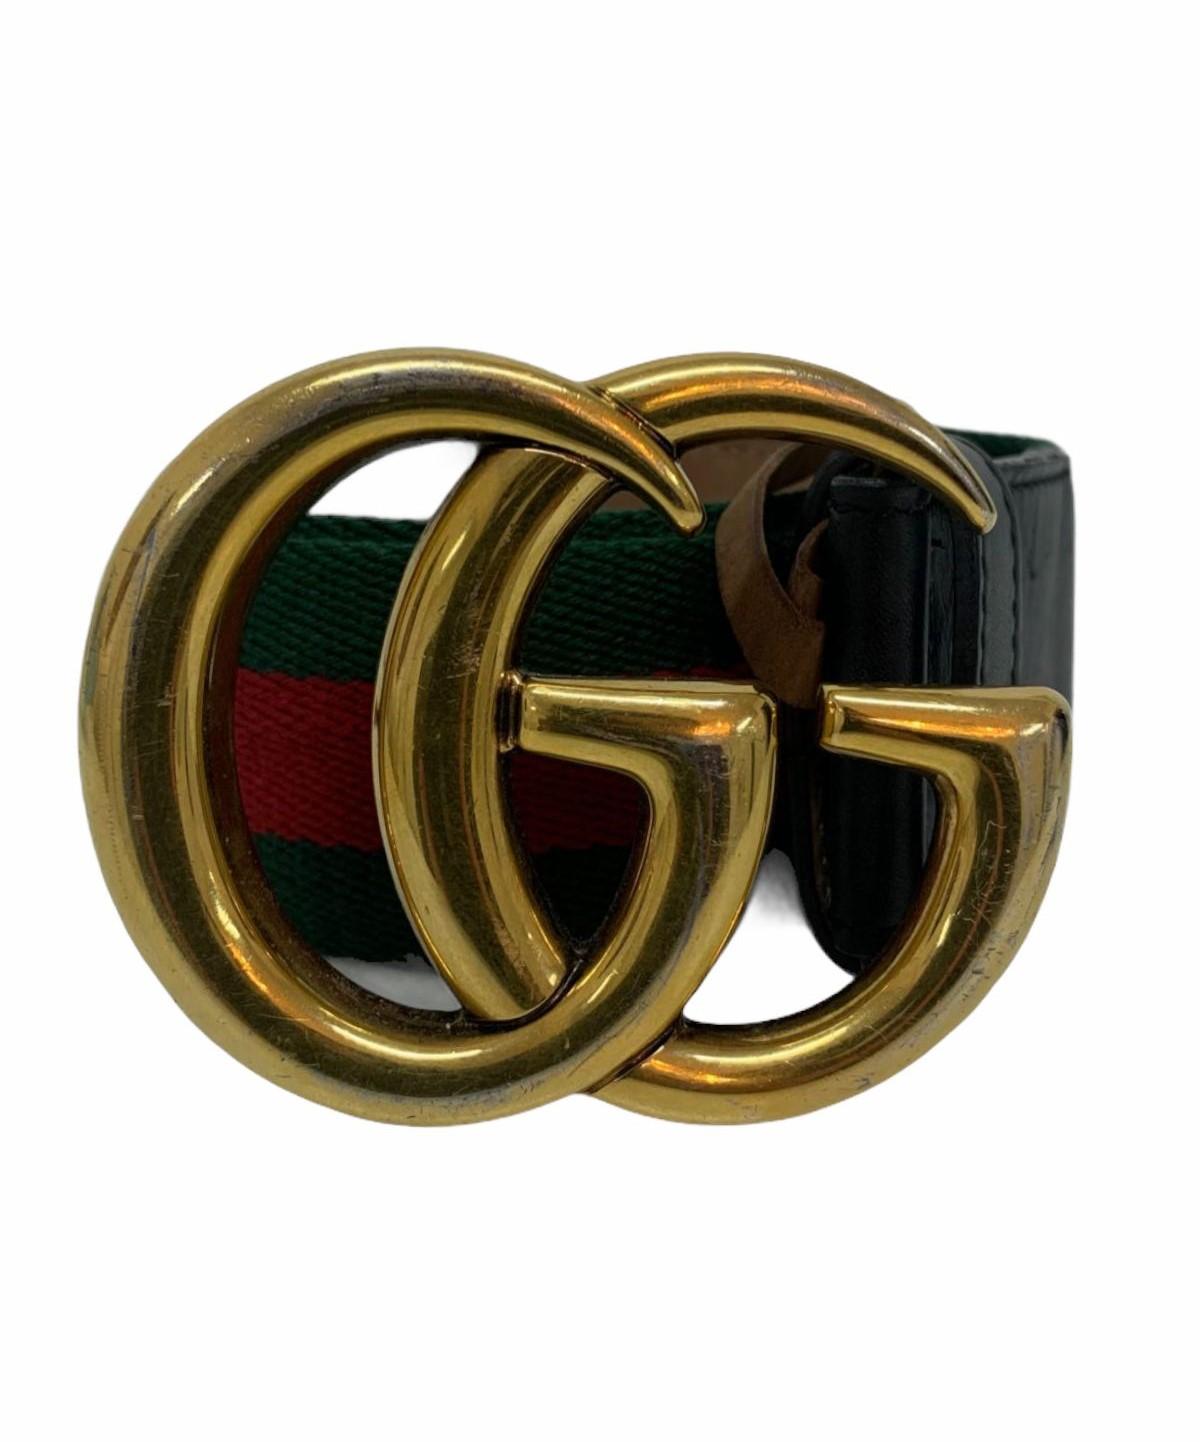 Cinto Gucci GG Marmont Web Bicolor